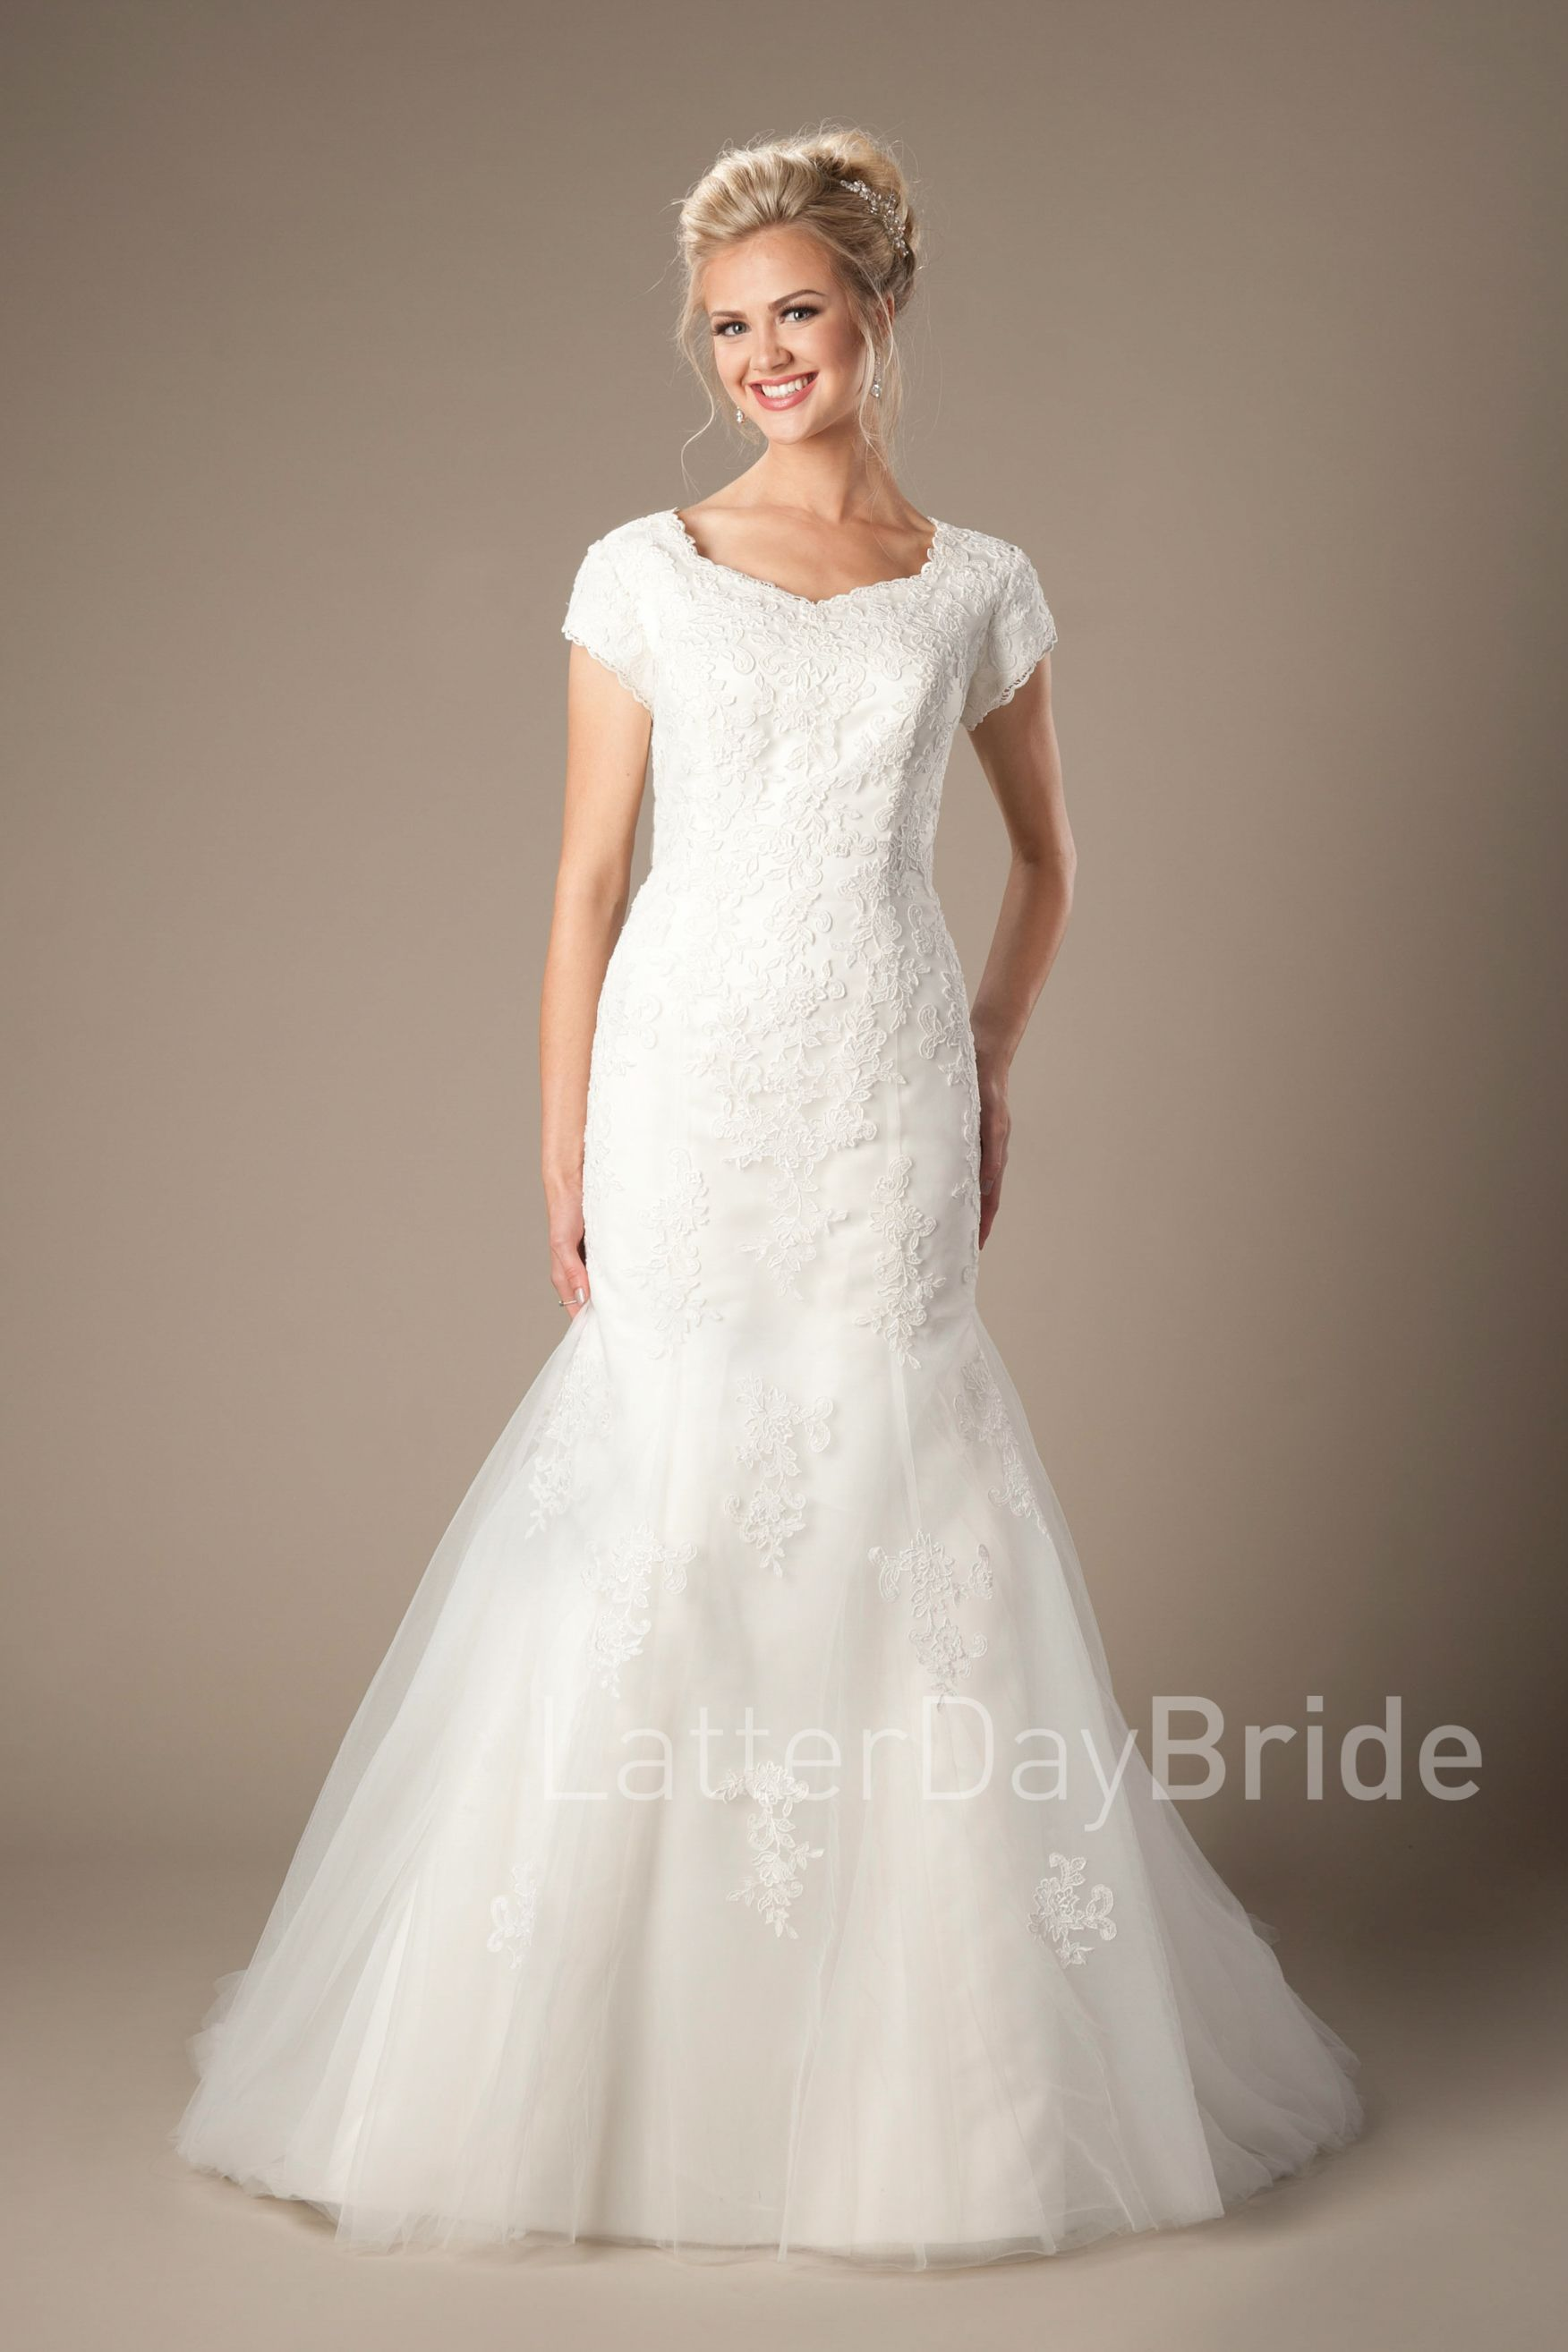 Cheap Wedding Dresses For Sale | Vestiditos